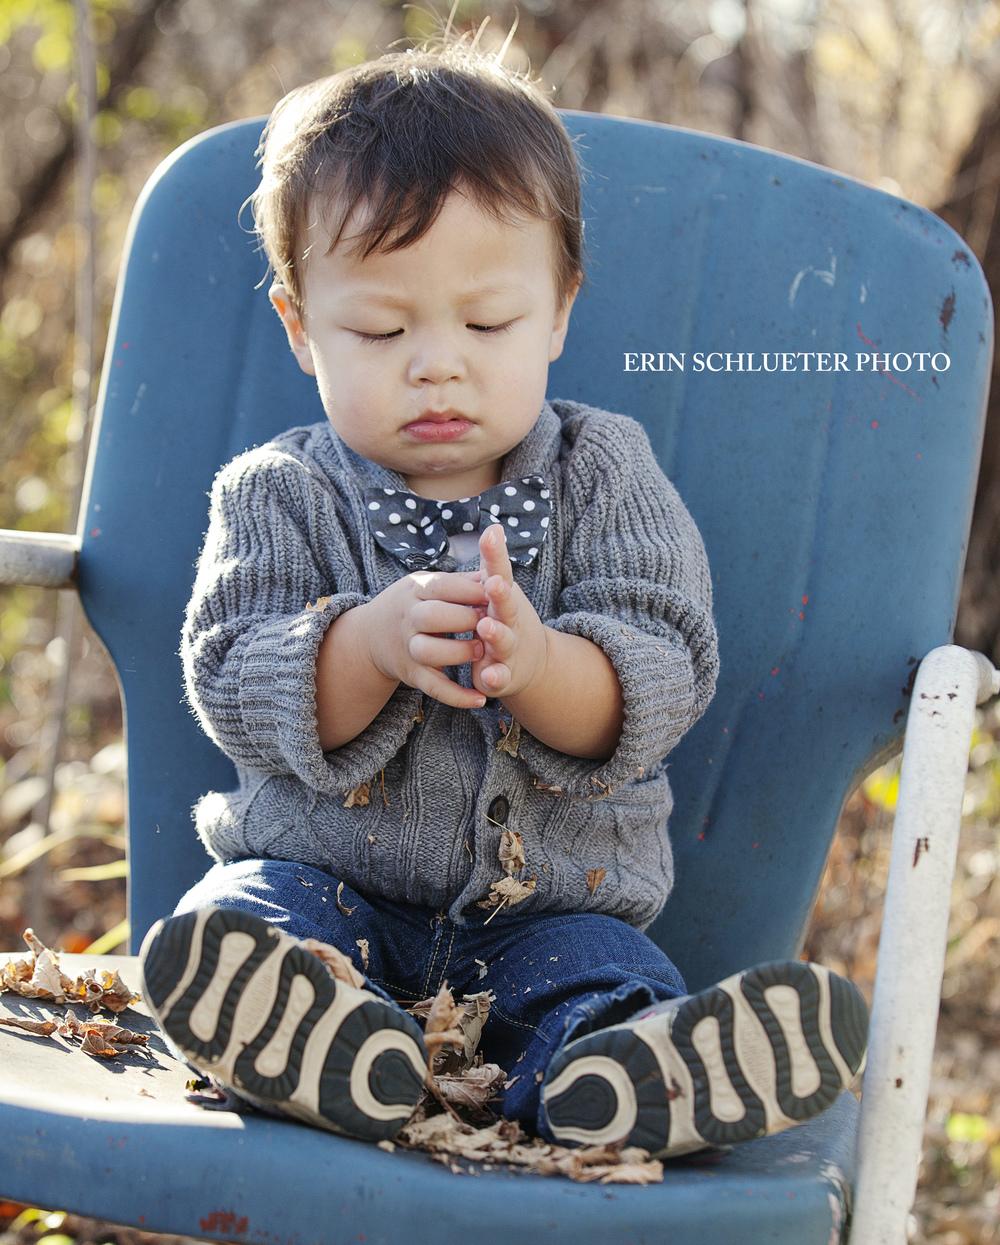 erinschlueterphotoBLOG_childrensphotographer.jpg